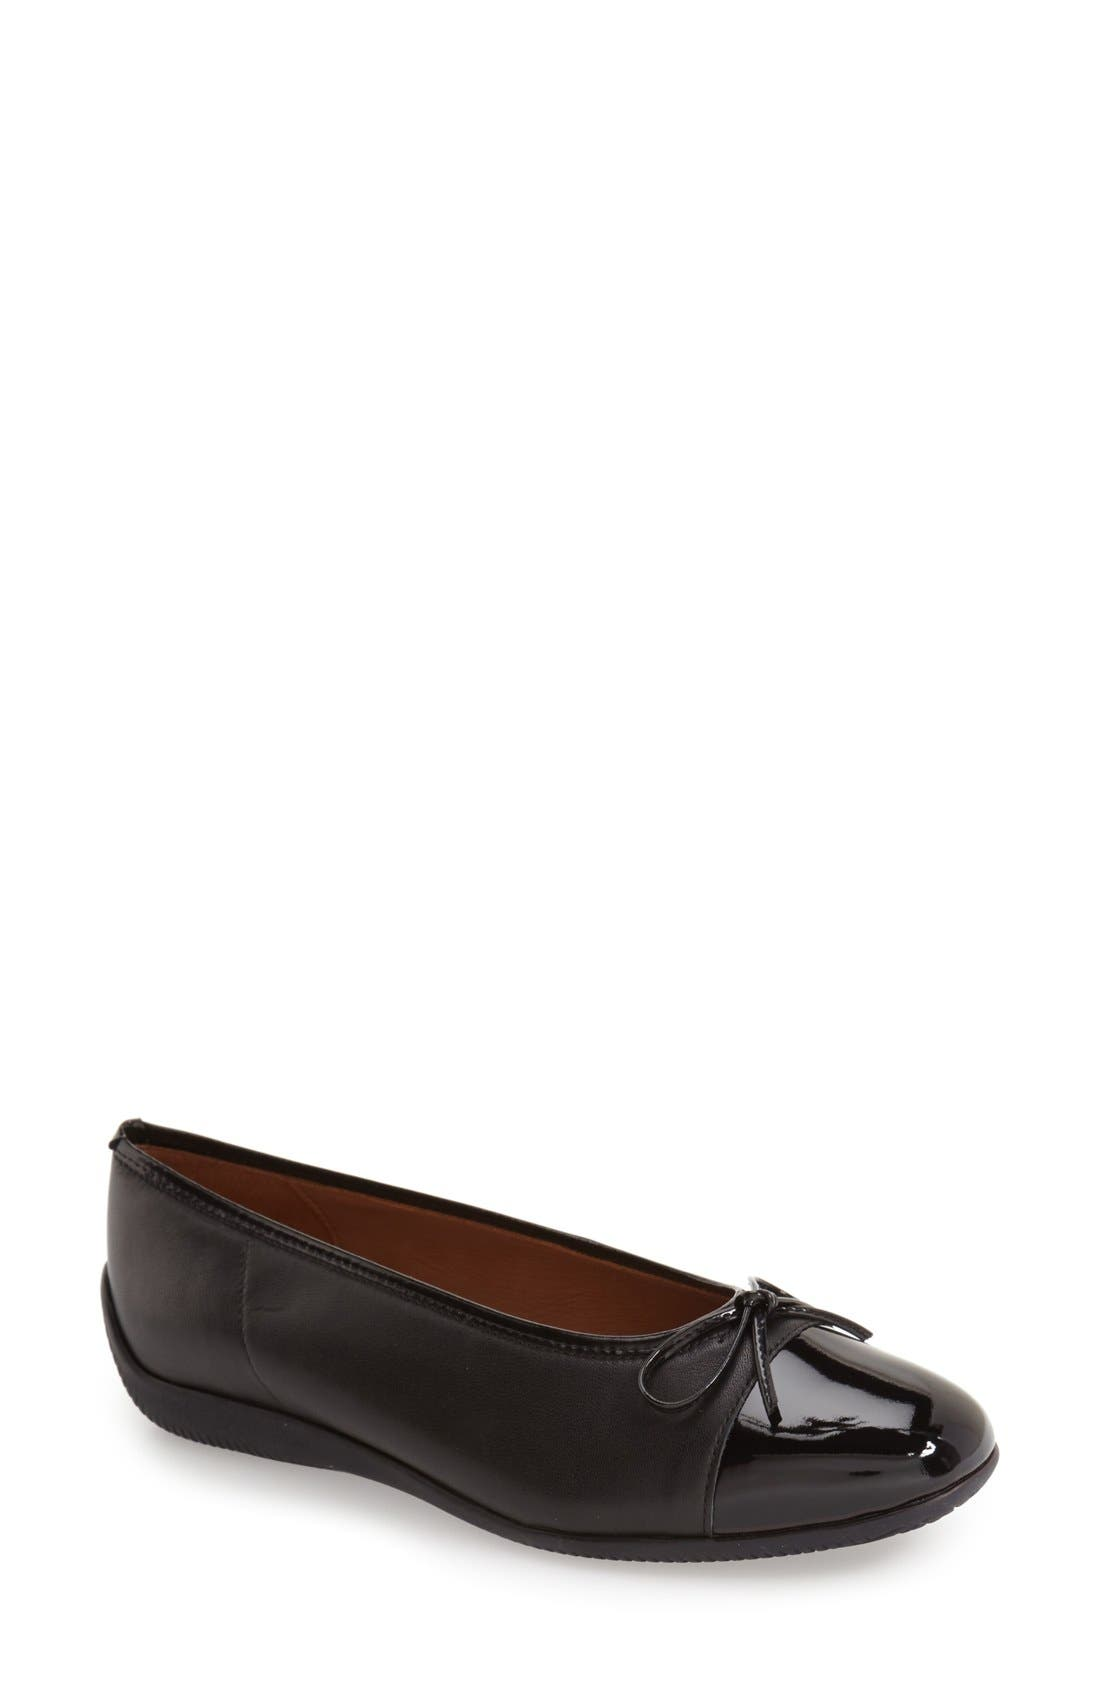 'Bella' Flat,                         Main,                         color, Black Leather